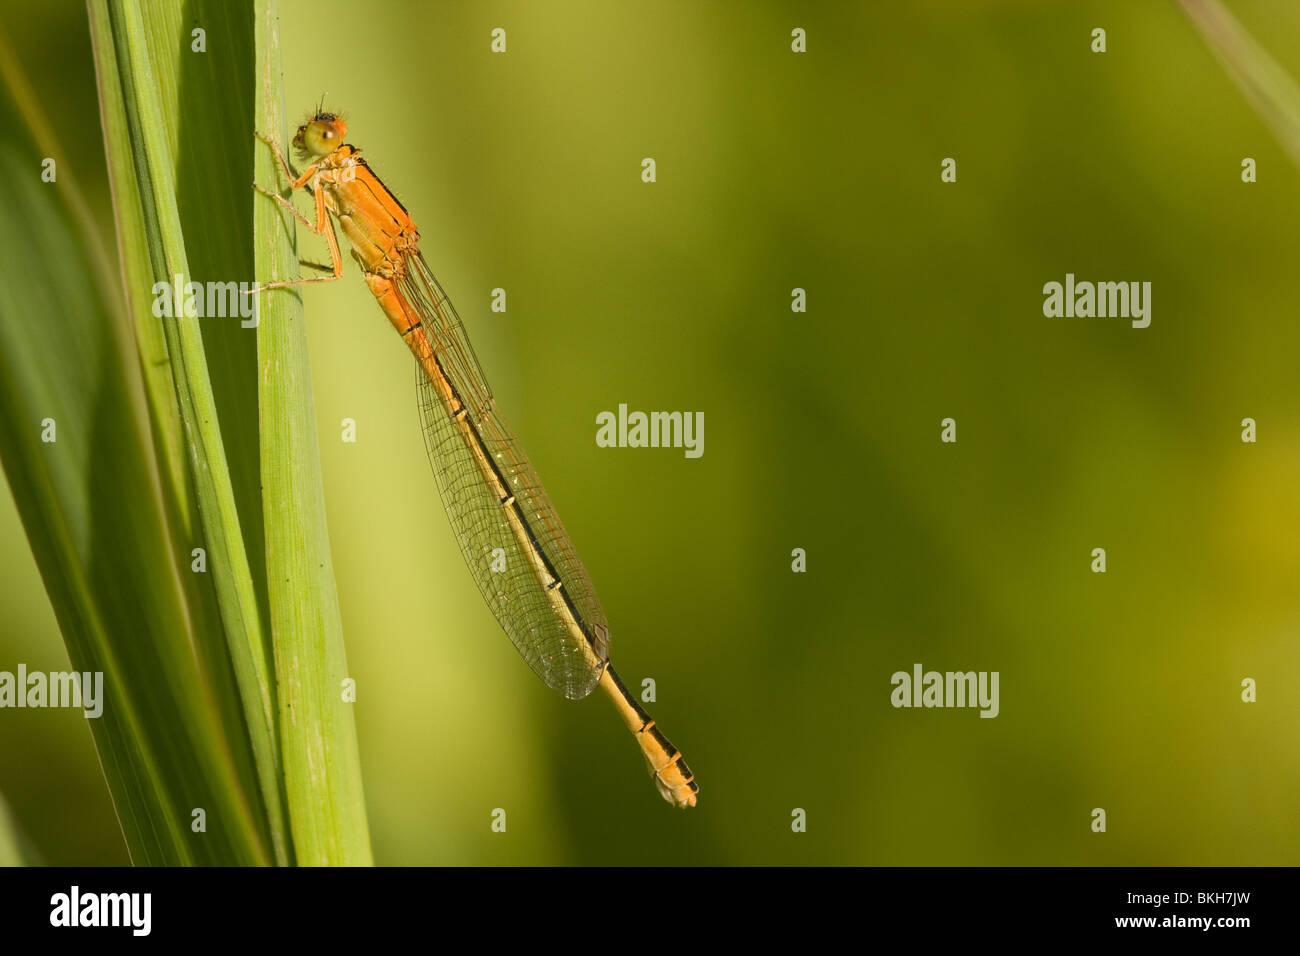 Orange Morph Stockfotos & Orange Morph Bilder - Alamy